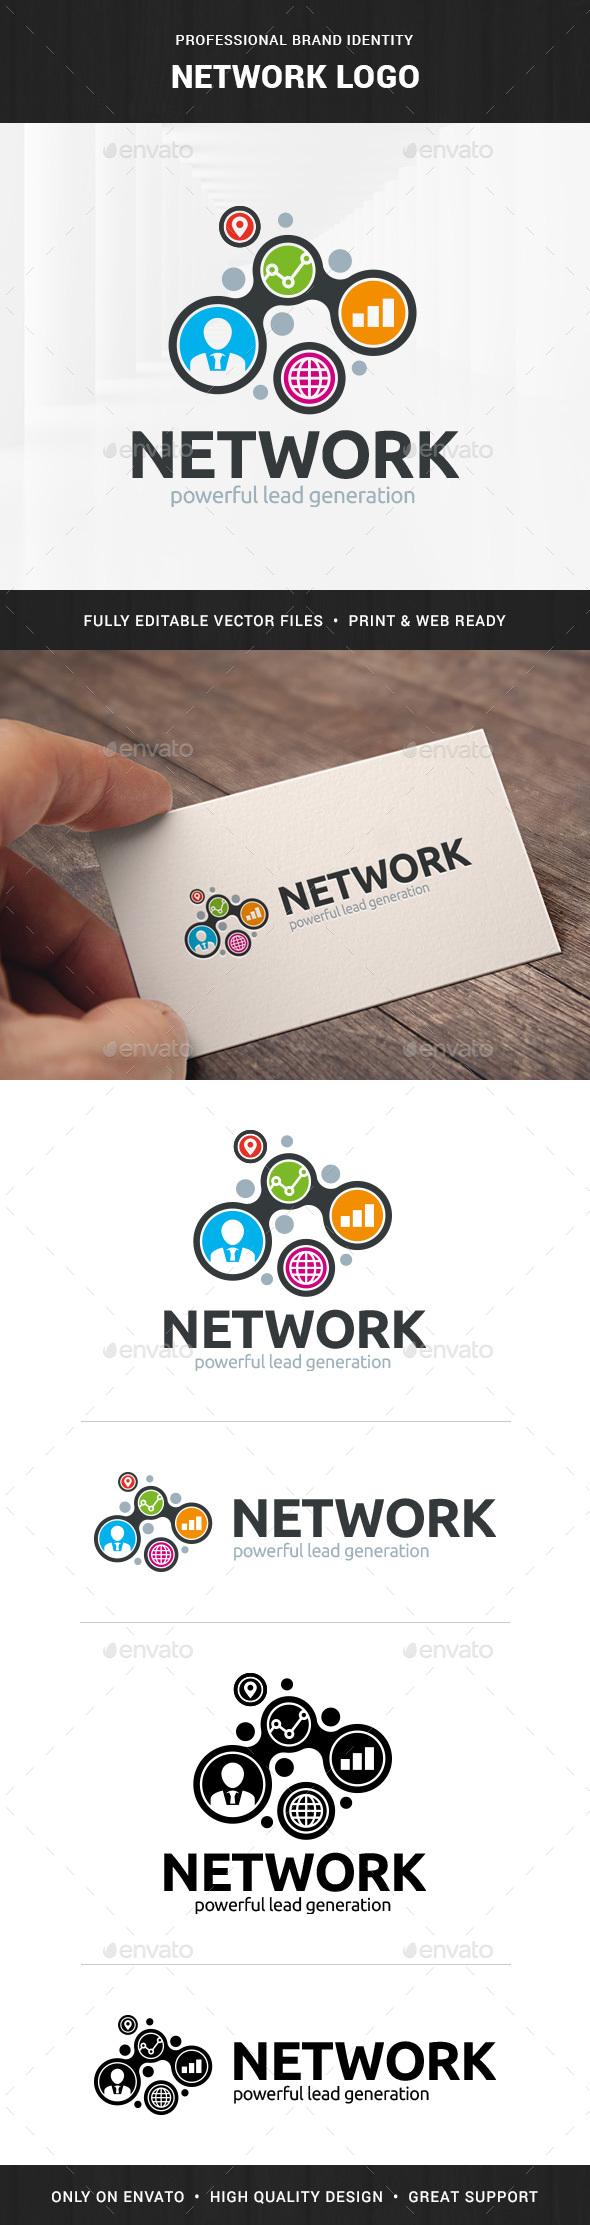 Network Logo Template